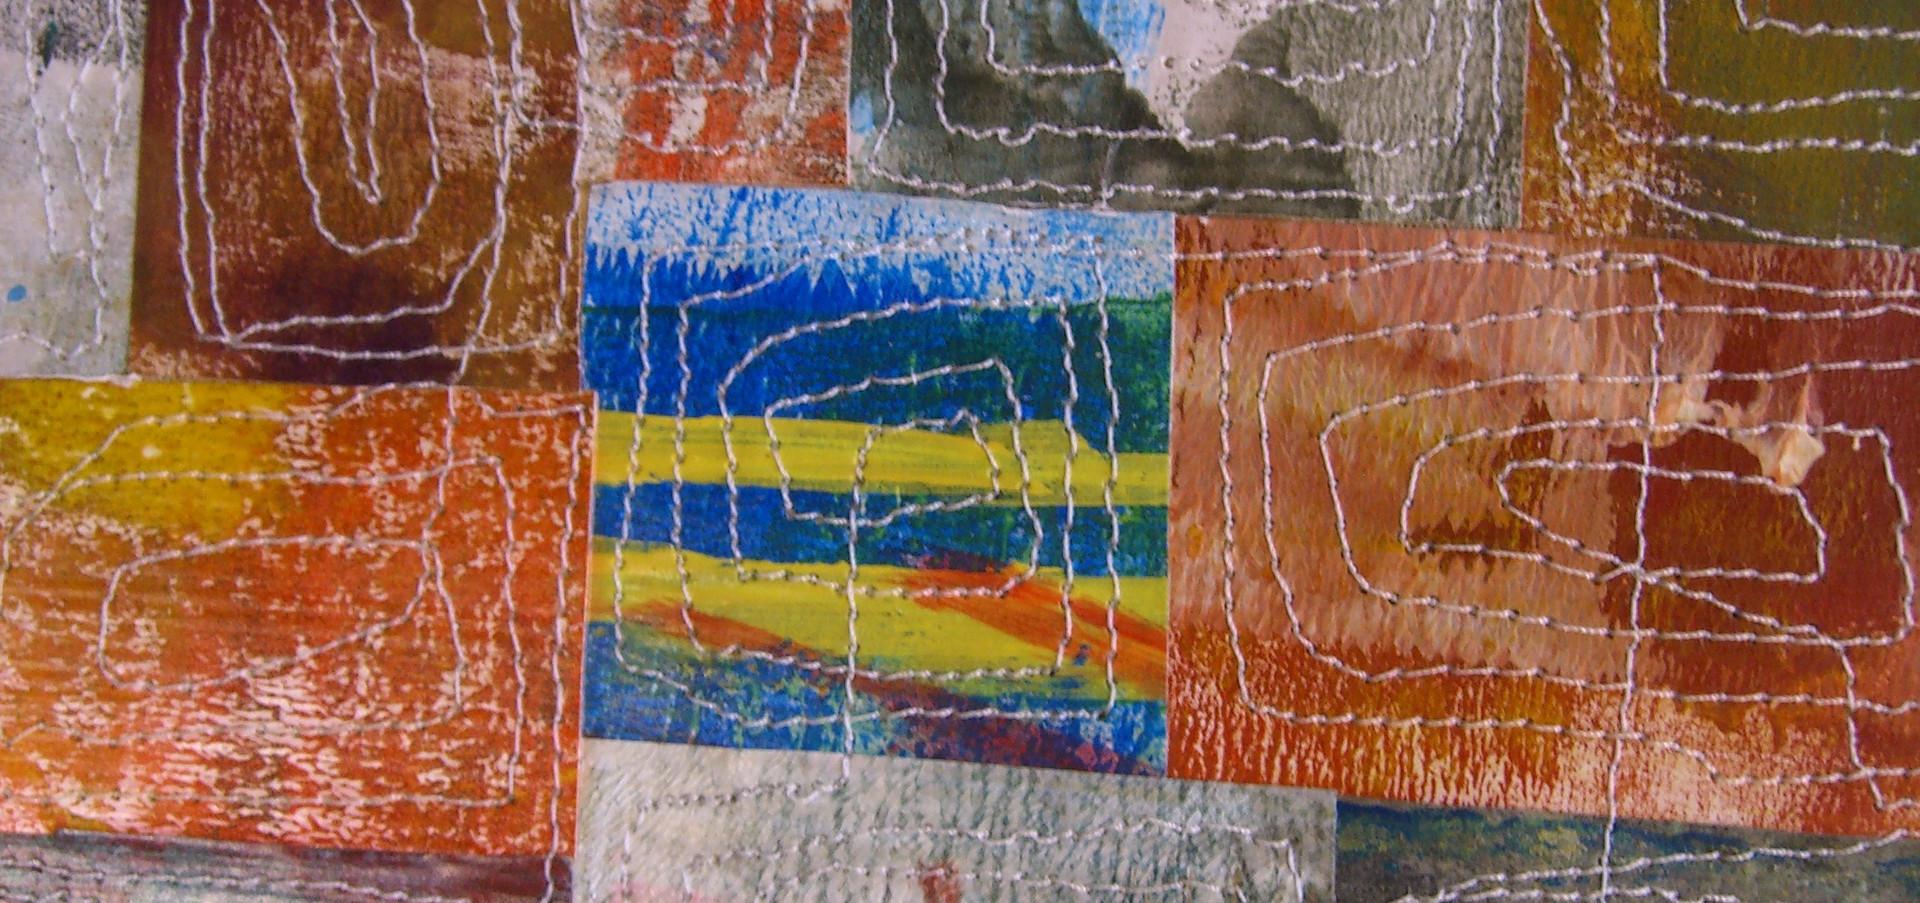 Painted Paper Quilt #7 (Detail)